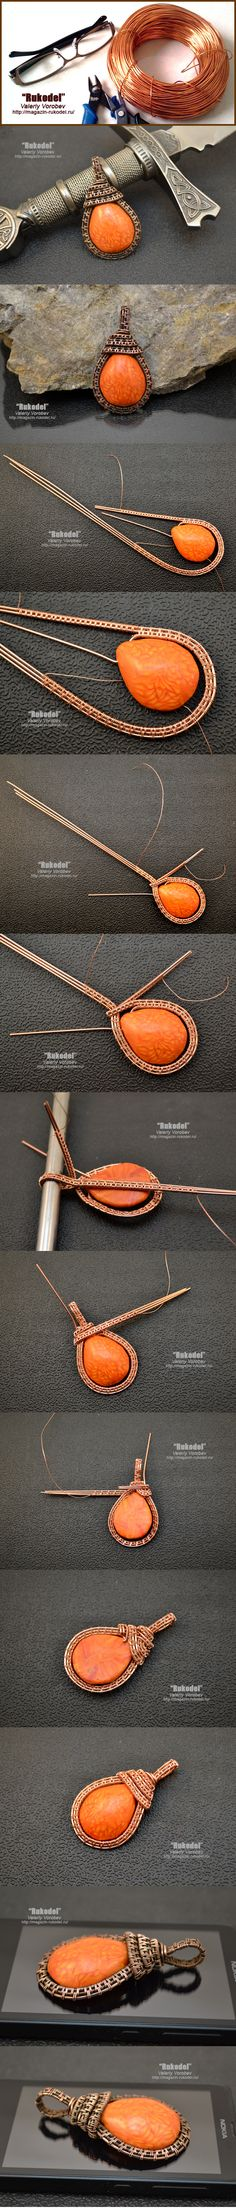 Wire Wrap Pendant  - кулон из полимерной глины и проволоки -  http://magazin-rukodel.ru/?p=4429